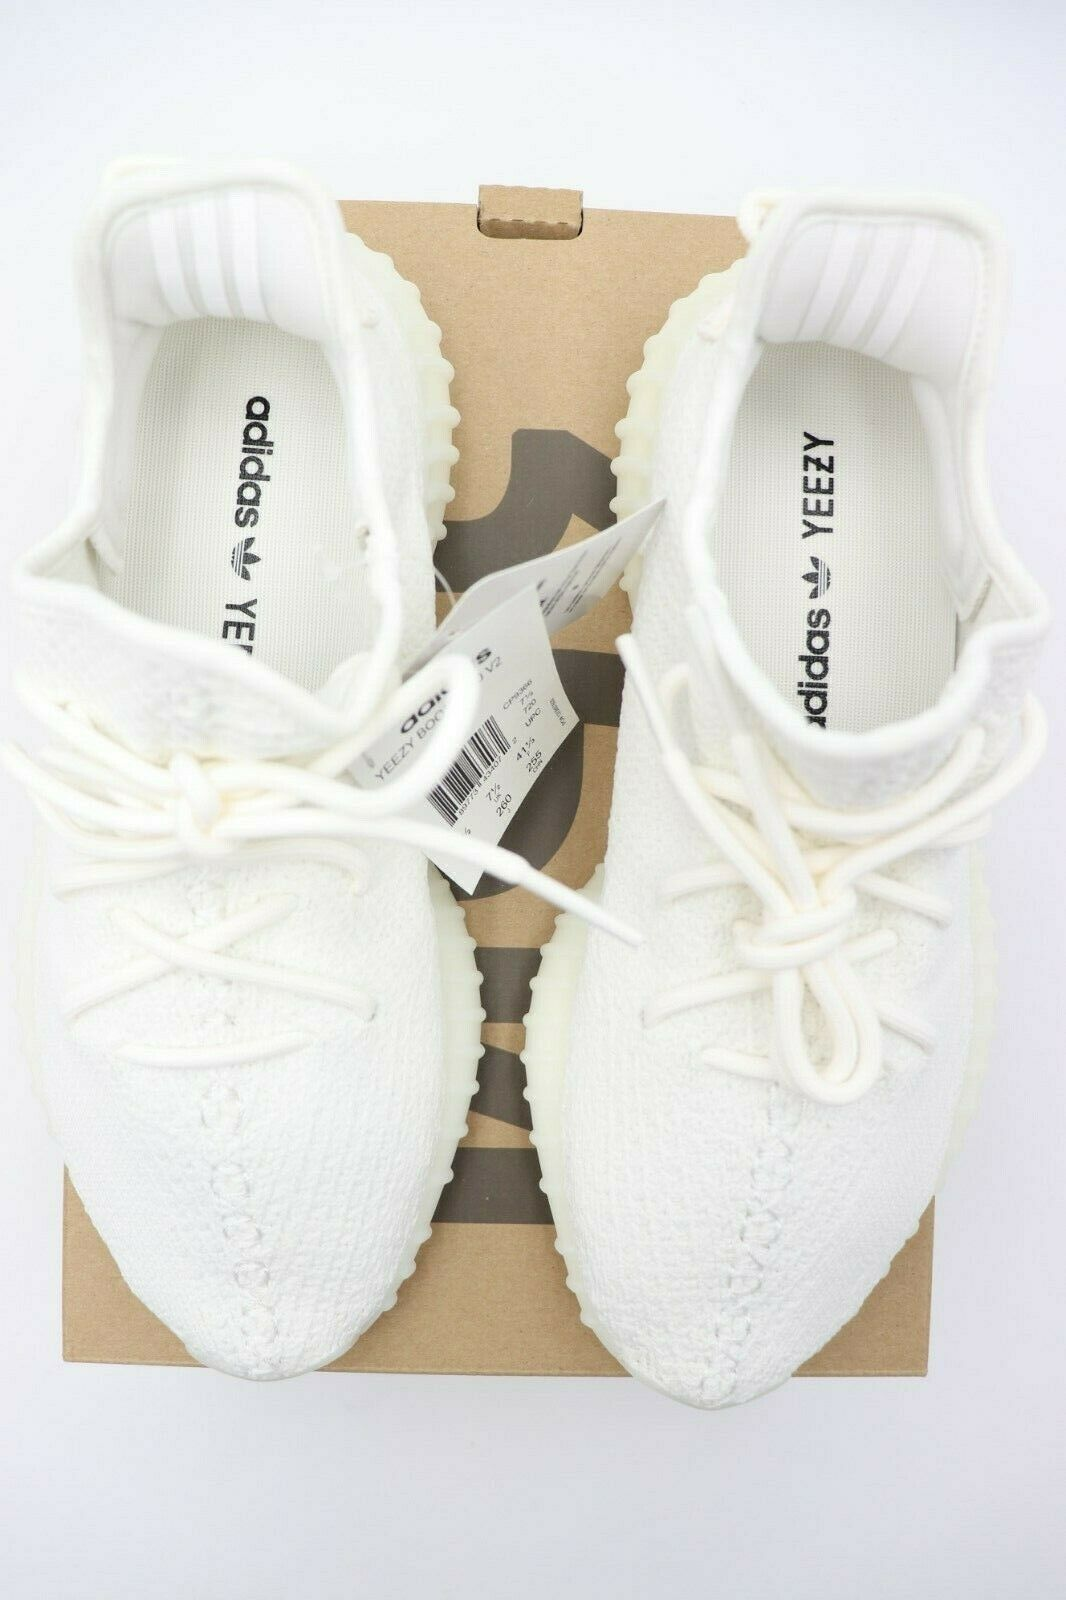 Neu in Box Adidas Yeezy Boost 350 V2 Triple Weiß Neu Größe 8 image 3